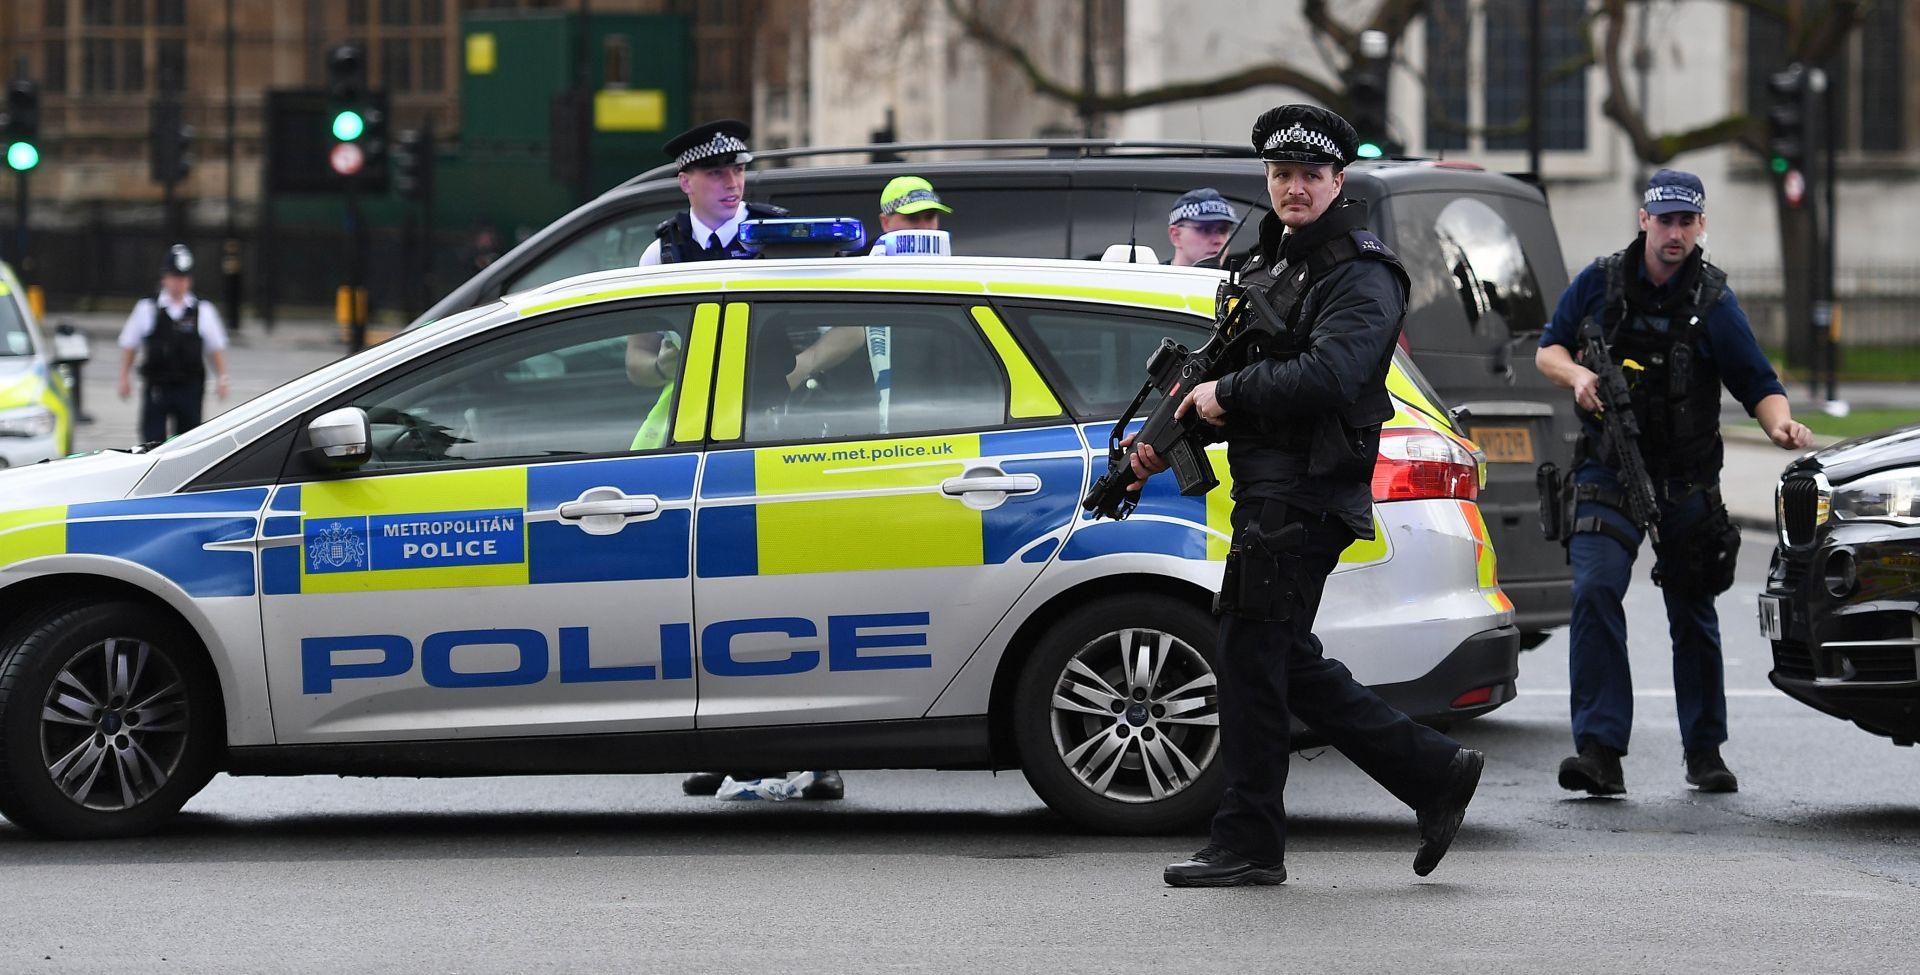 ISIS PREUZEO ODGOVORNOST: Policija objavila identitet napadača iz Londona